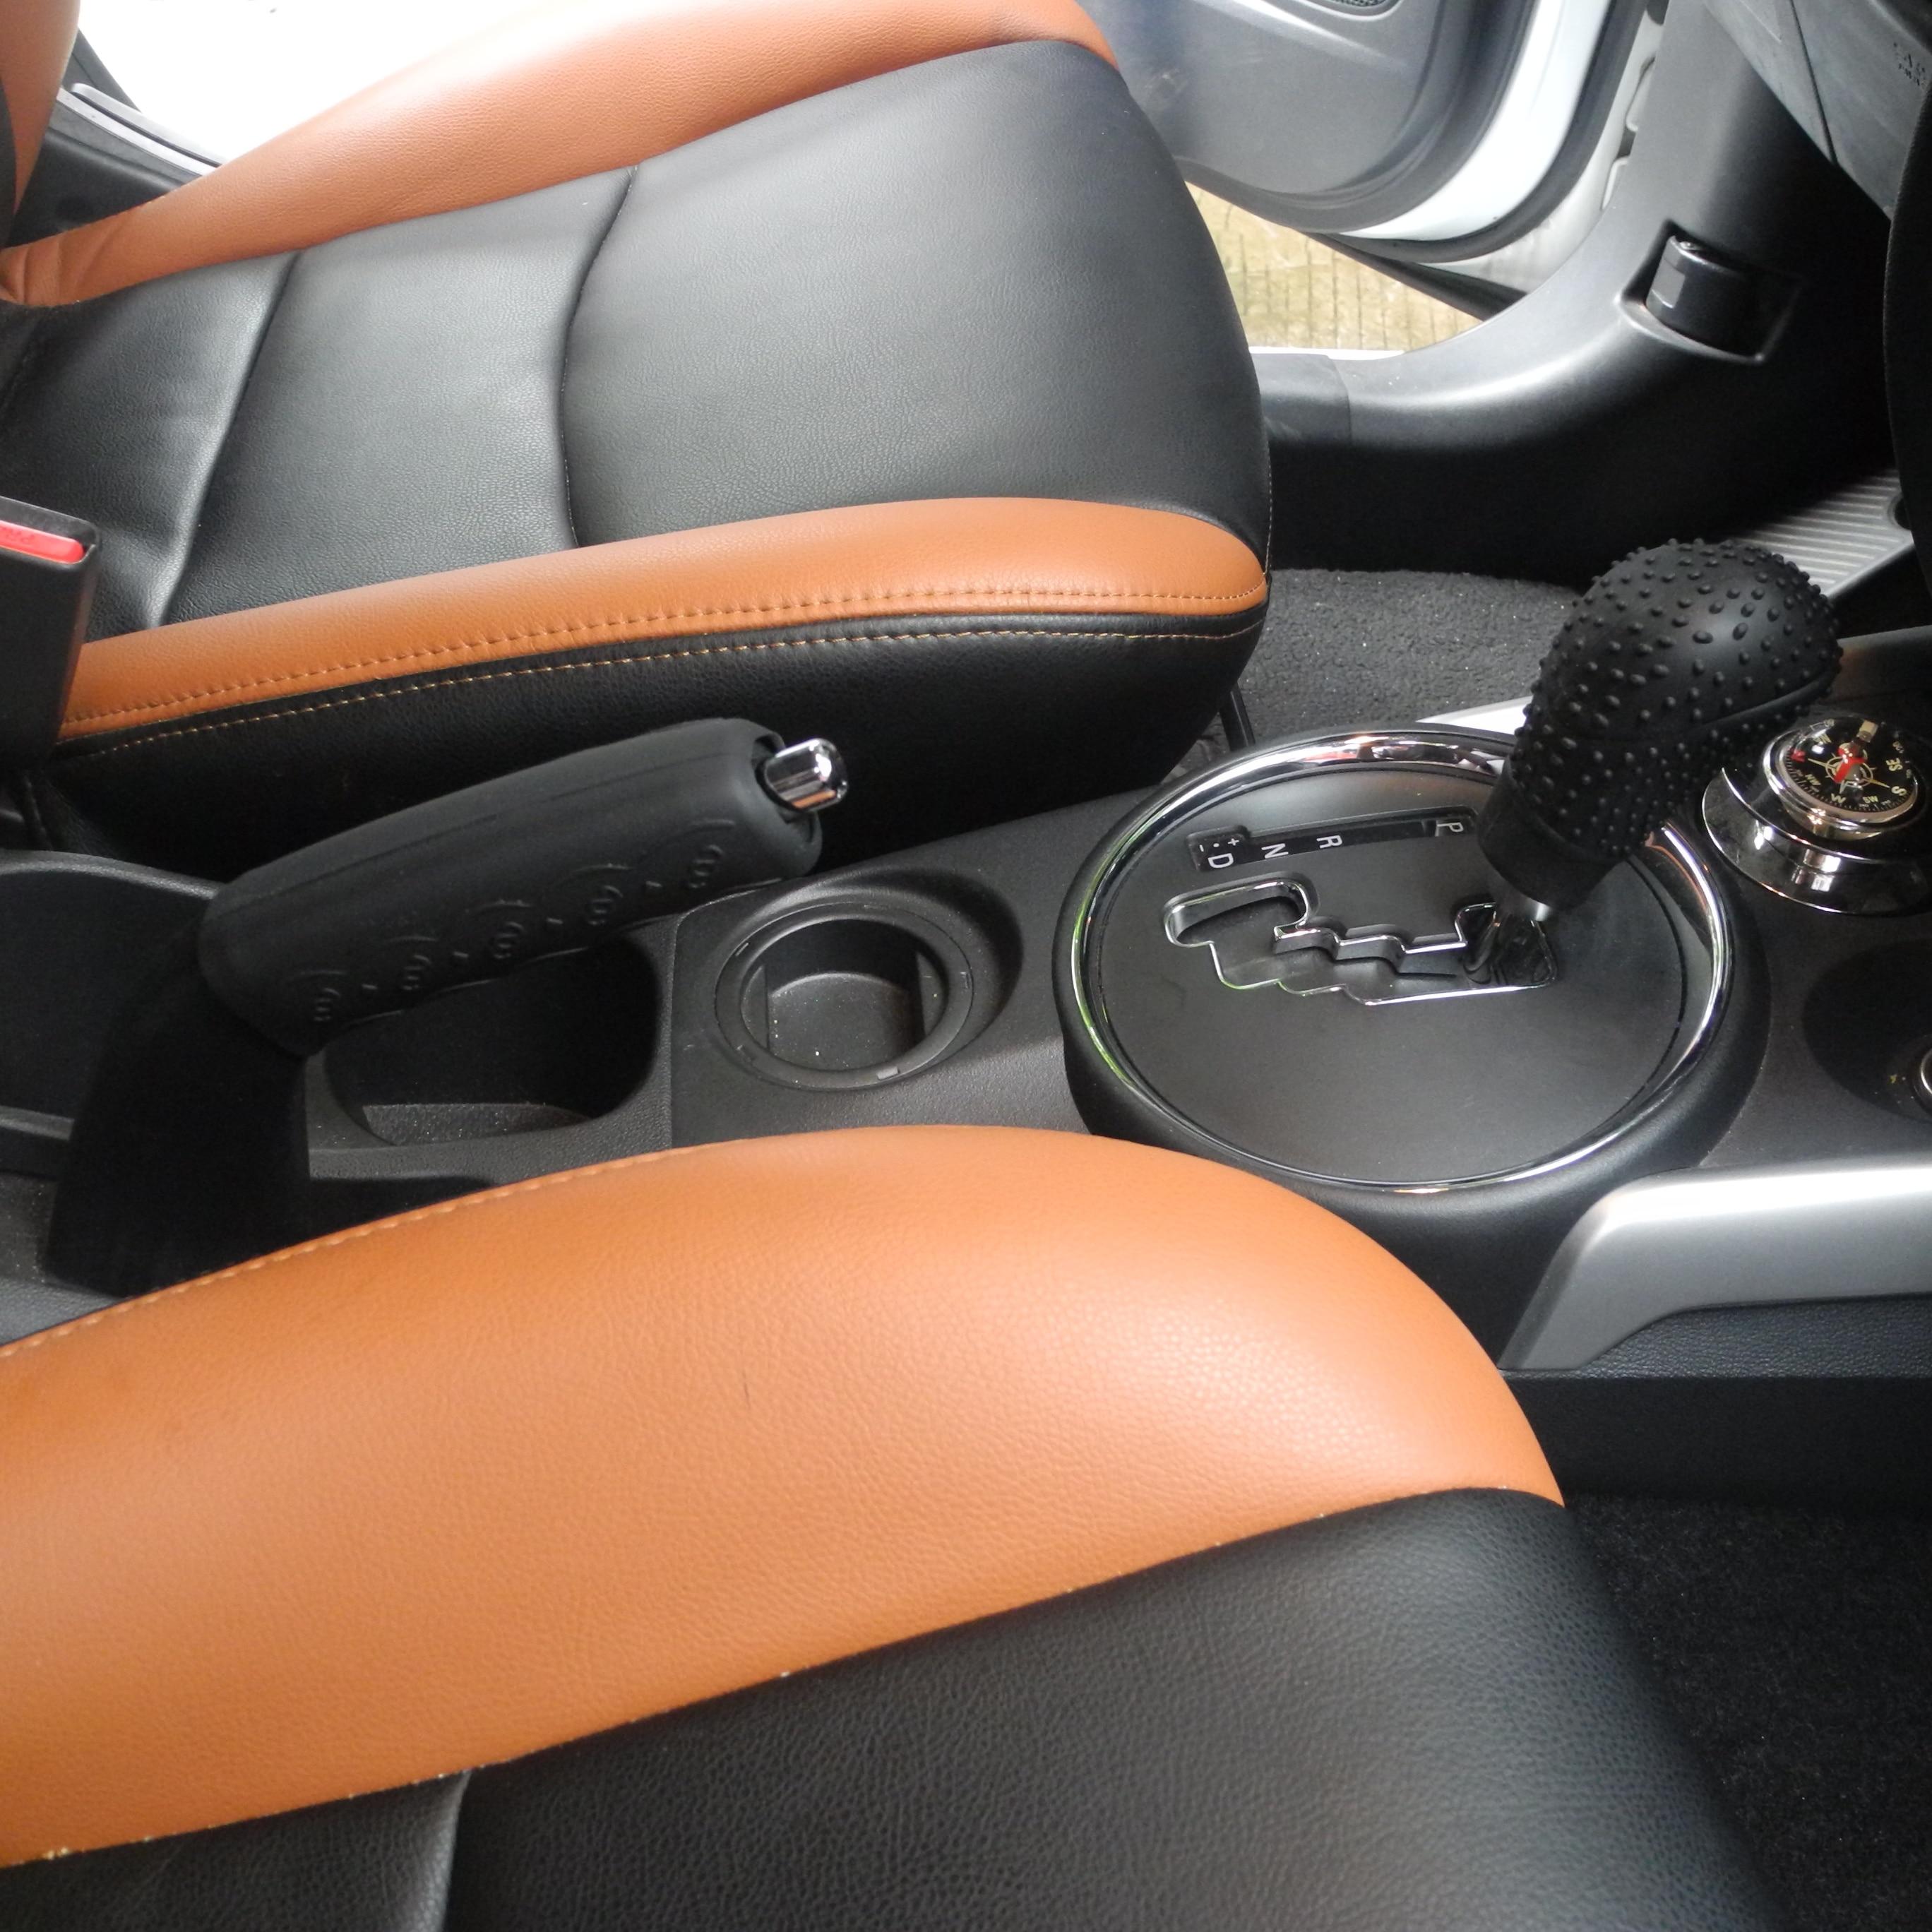 A Set Silicone Manual Car Gear Head Shift Knob Cover Gear Shift Collars Handbrake Grip Hand Brake Universal Cover Case